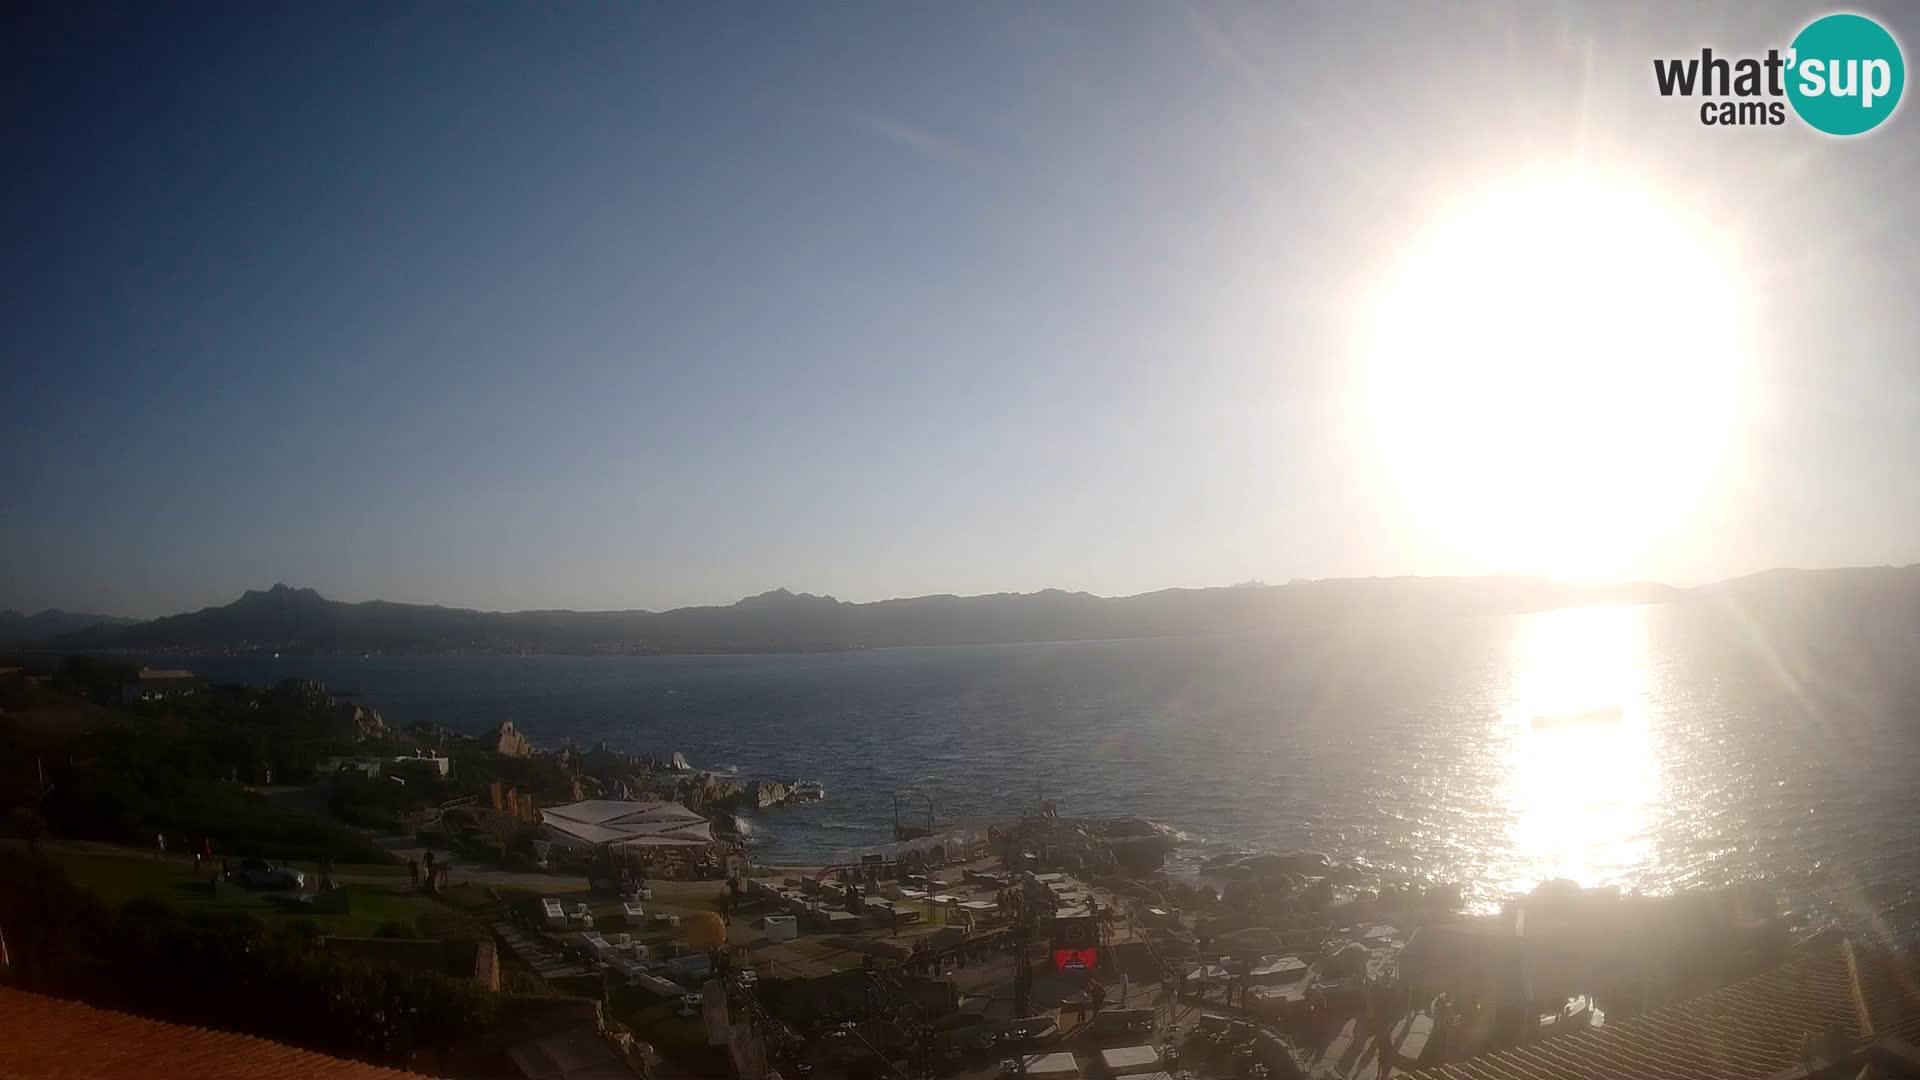 Live Phi Beach – Forte Cappellini camera en vivo Porto Cervo – Arzachena – Cerdeña